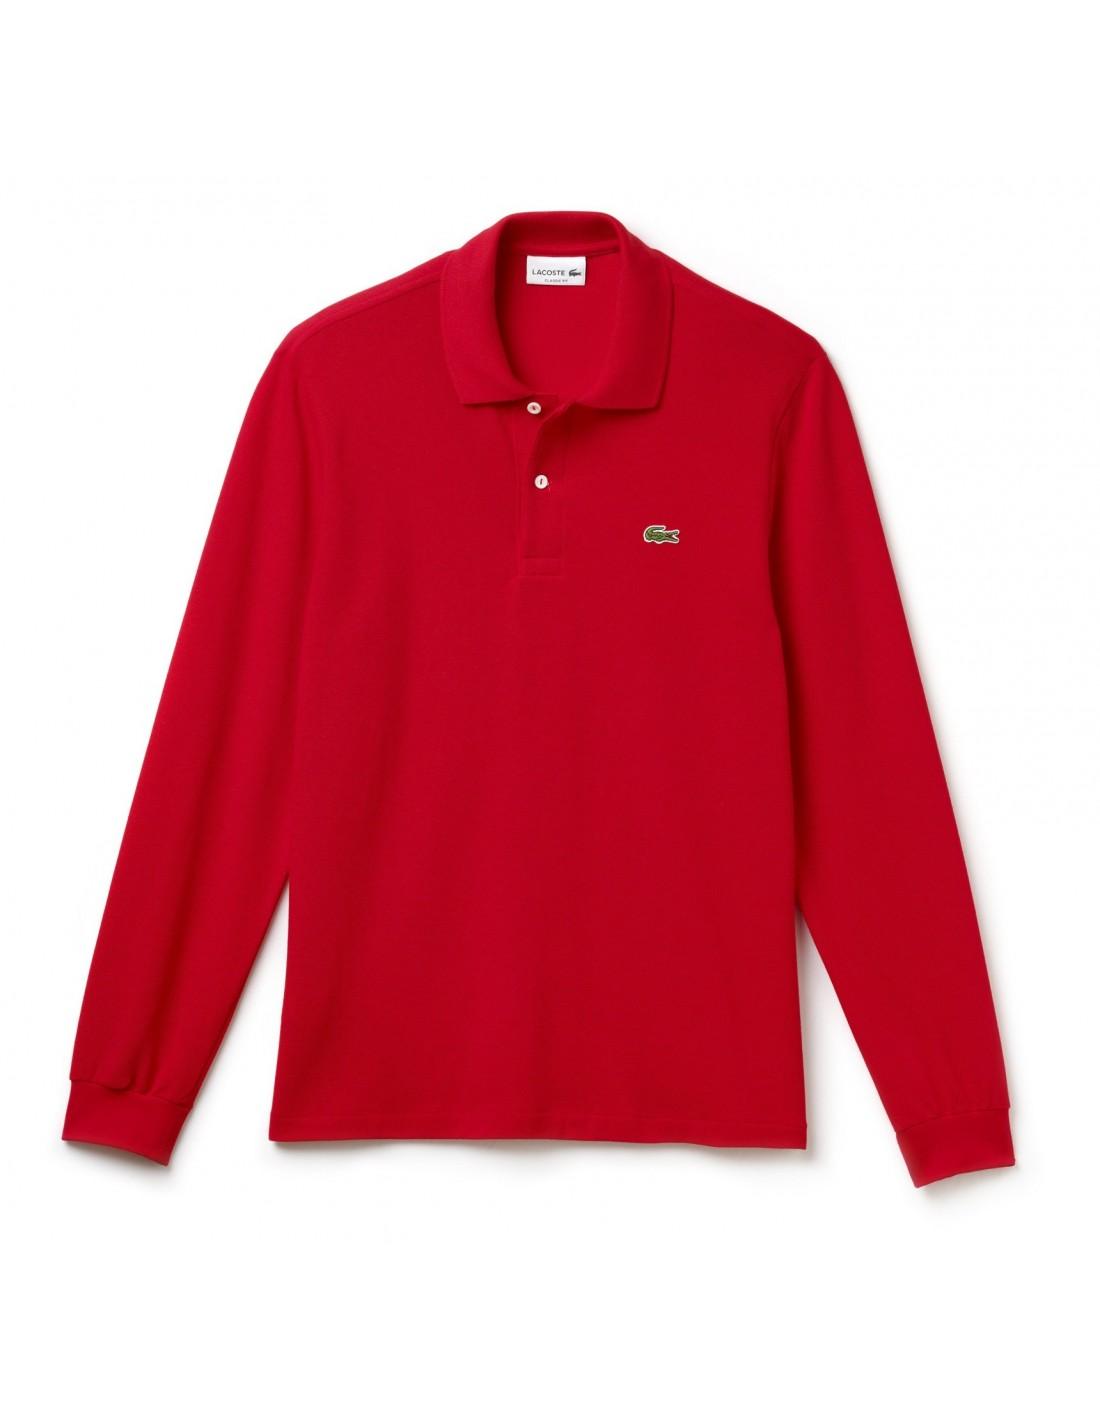 b5d999b8706 Polo Lacoste Classica maniche lunghe Rouge